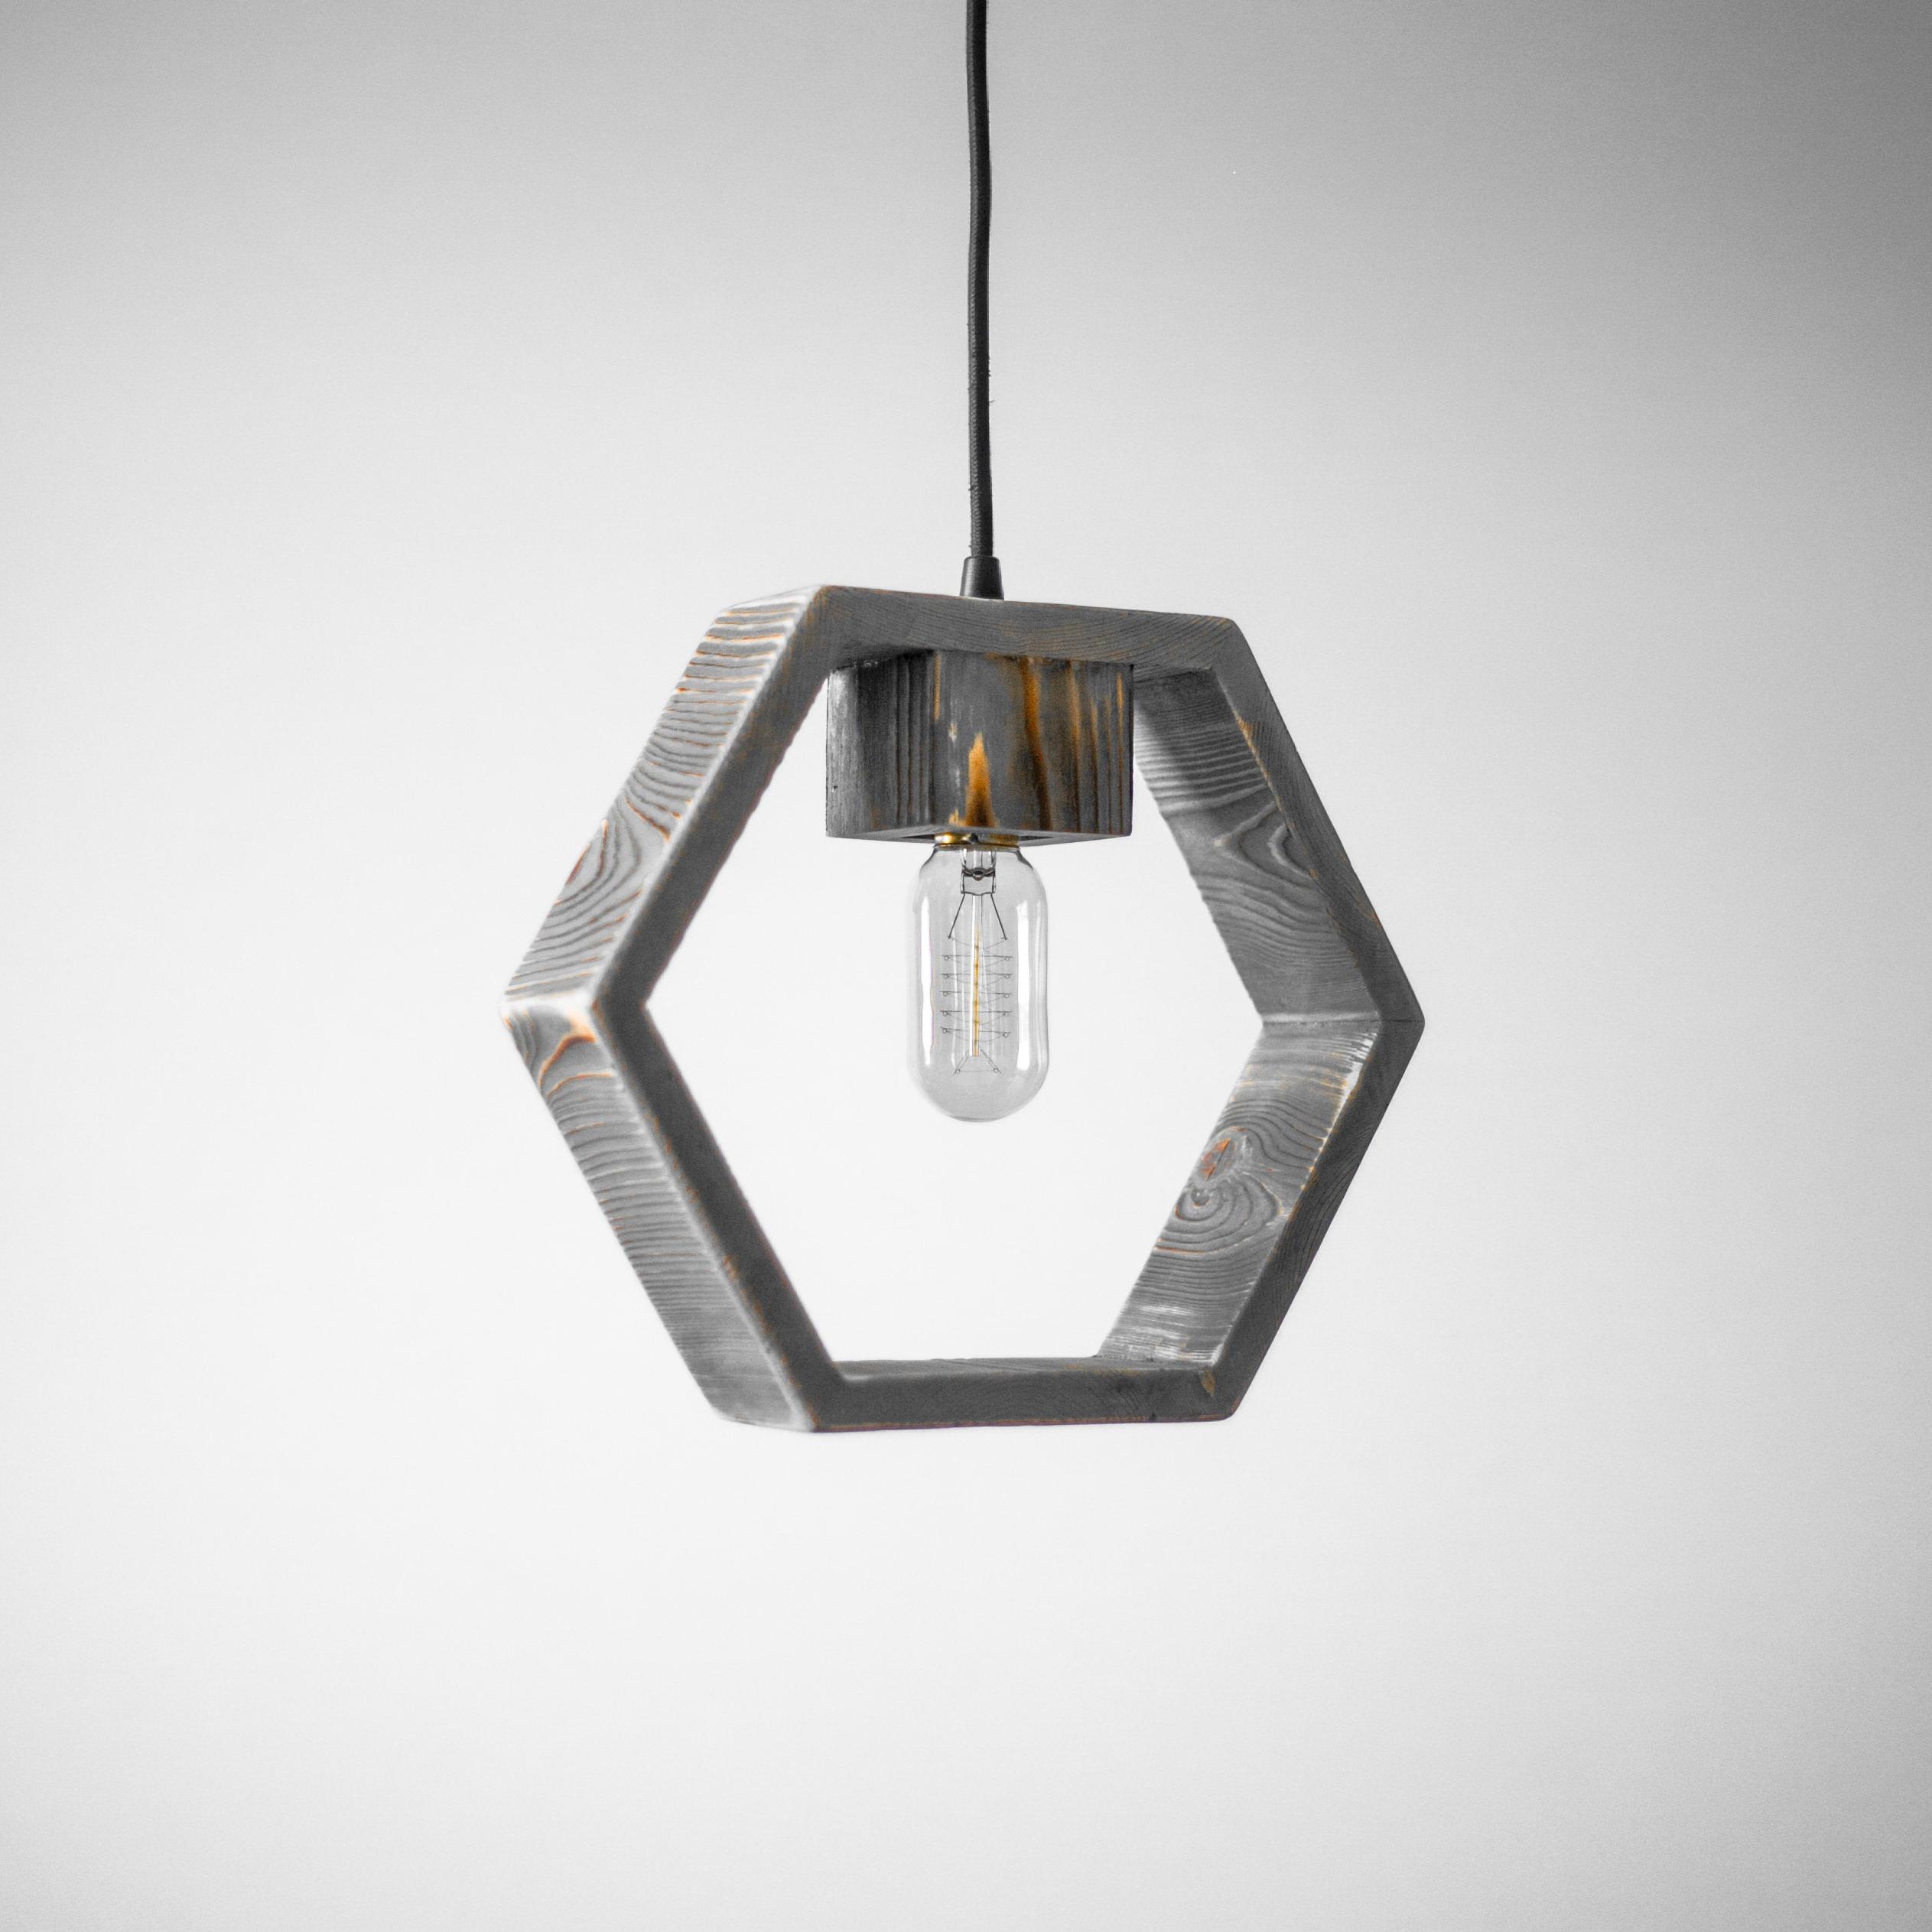 Hexagon Wood Pendant Light / Geometric Pendant Light / Modern Lamp /  Minimalistic Style / Industrial / Loft / Hanging Light / Chandelier In Widely Used Rossi Industrial Vintage 1 Light Geometric Pendants (View 7 of 25)